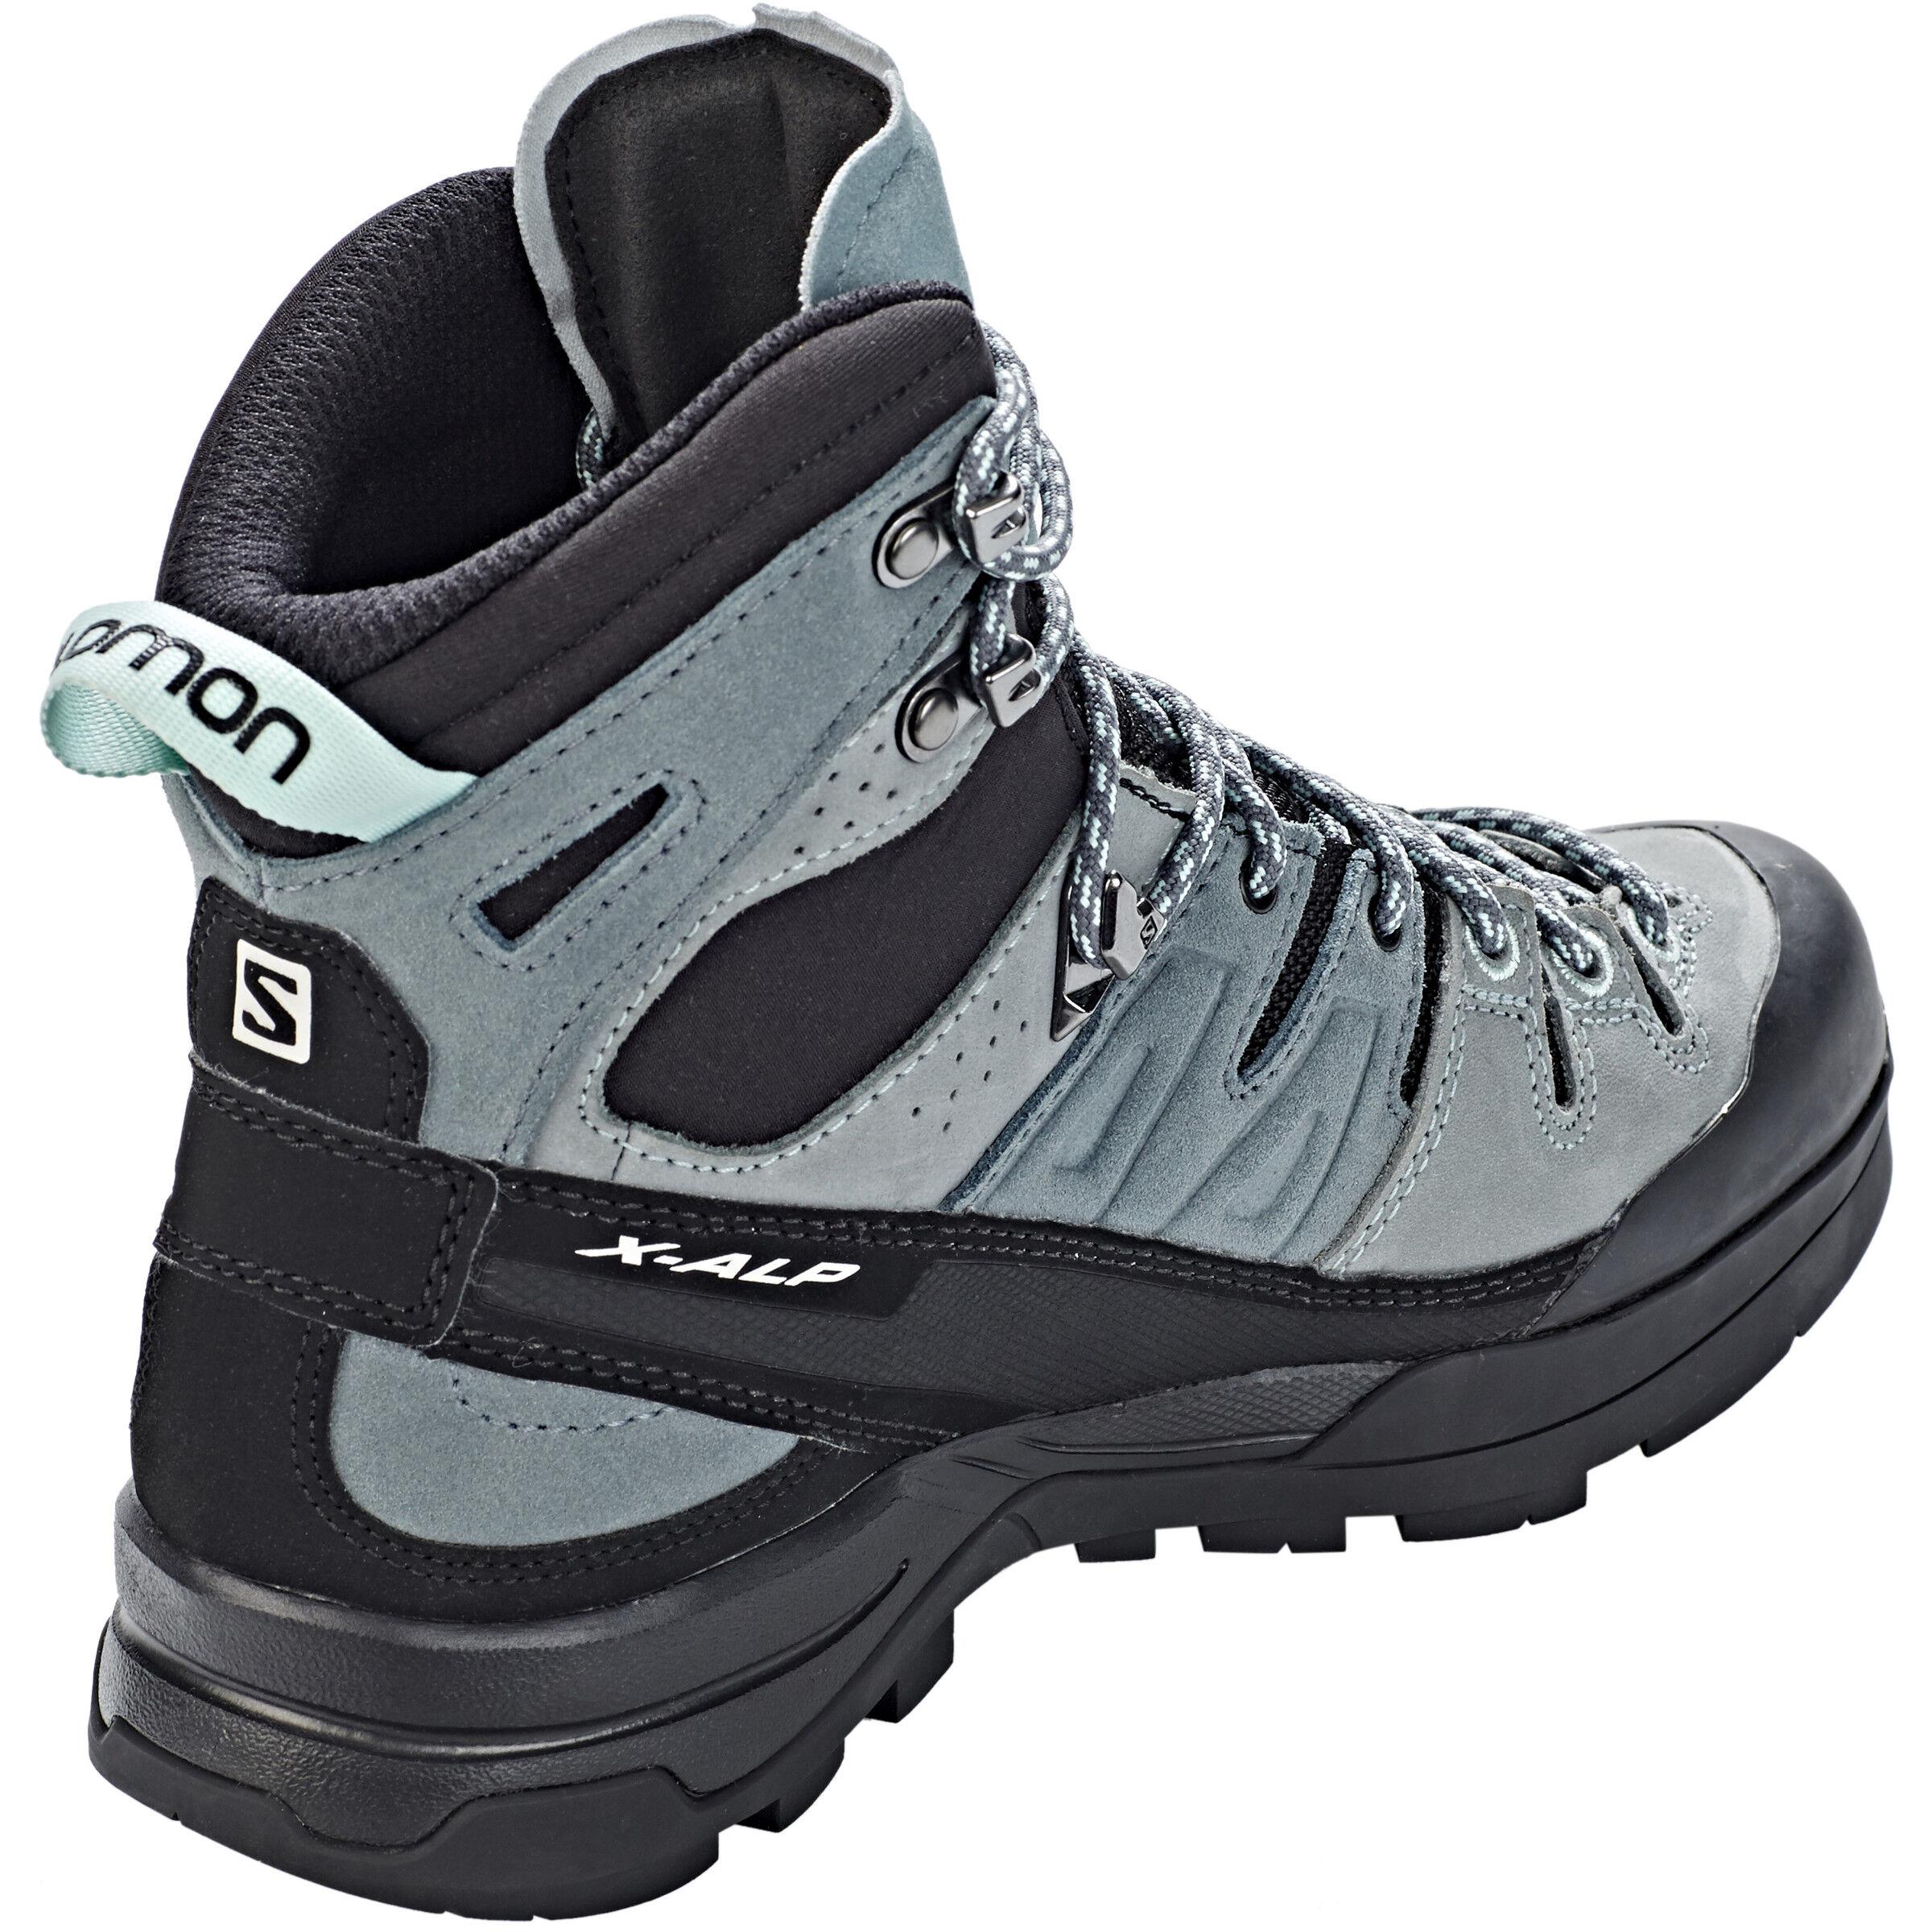 Salomon X Alp High LTR GTX Shoes Damen leadstormy weatherbeach glass